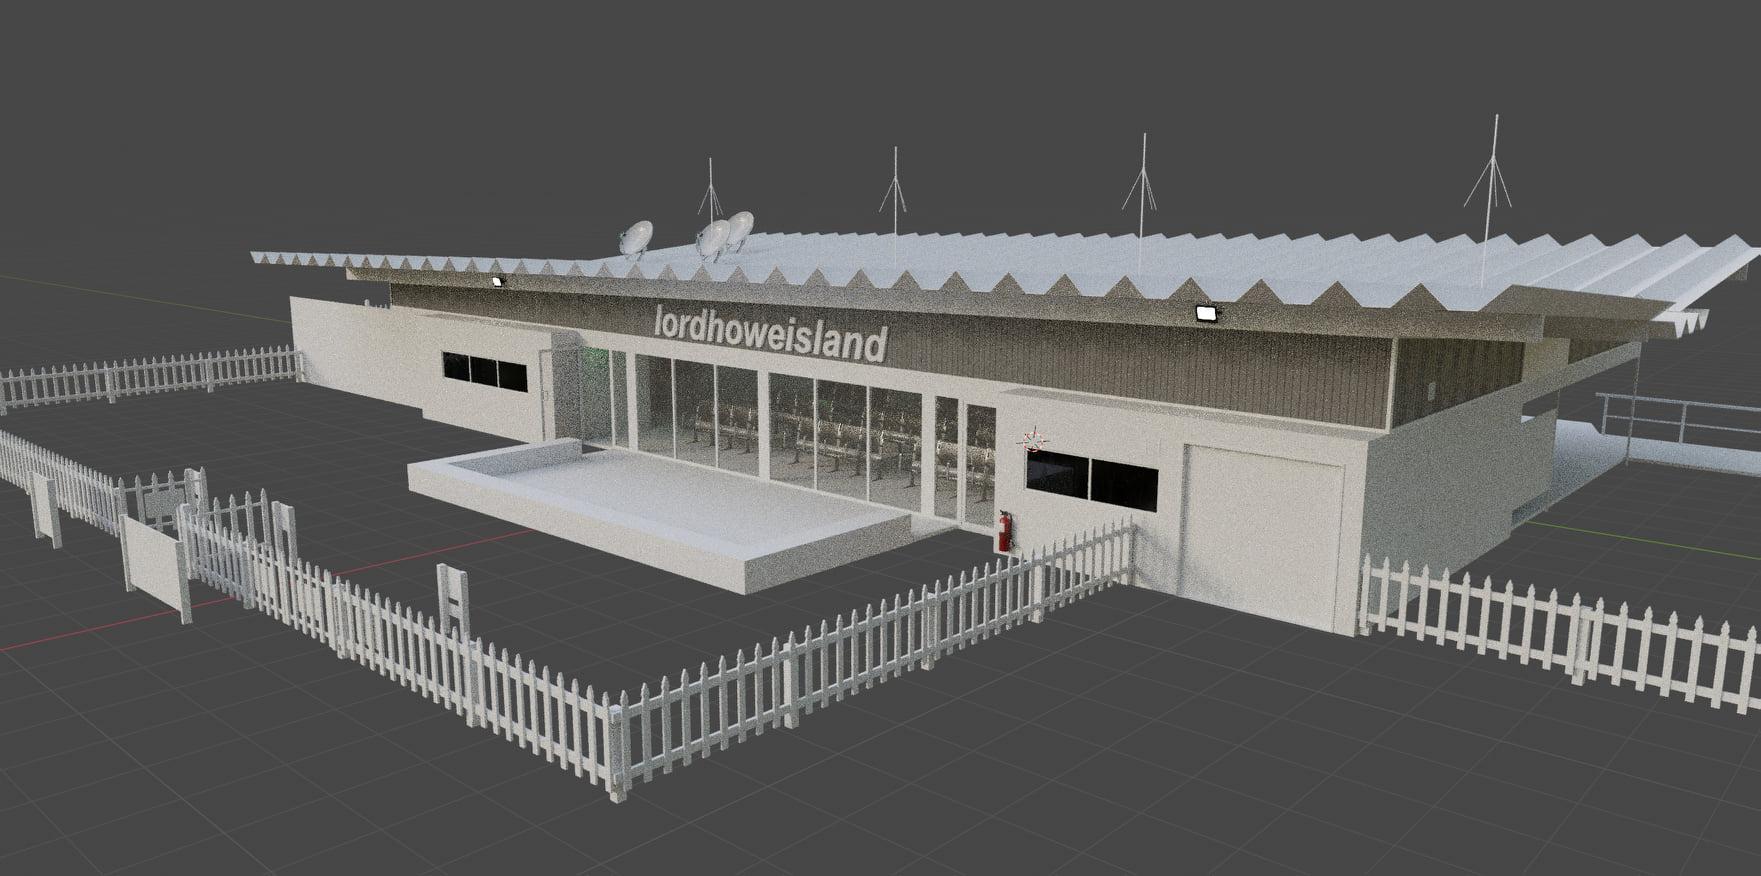 Microsoft Flight Simulator Lord Howe